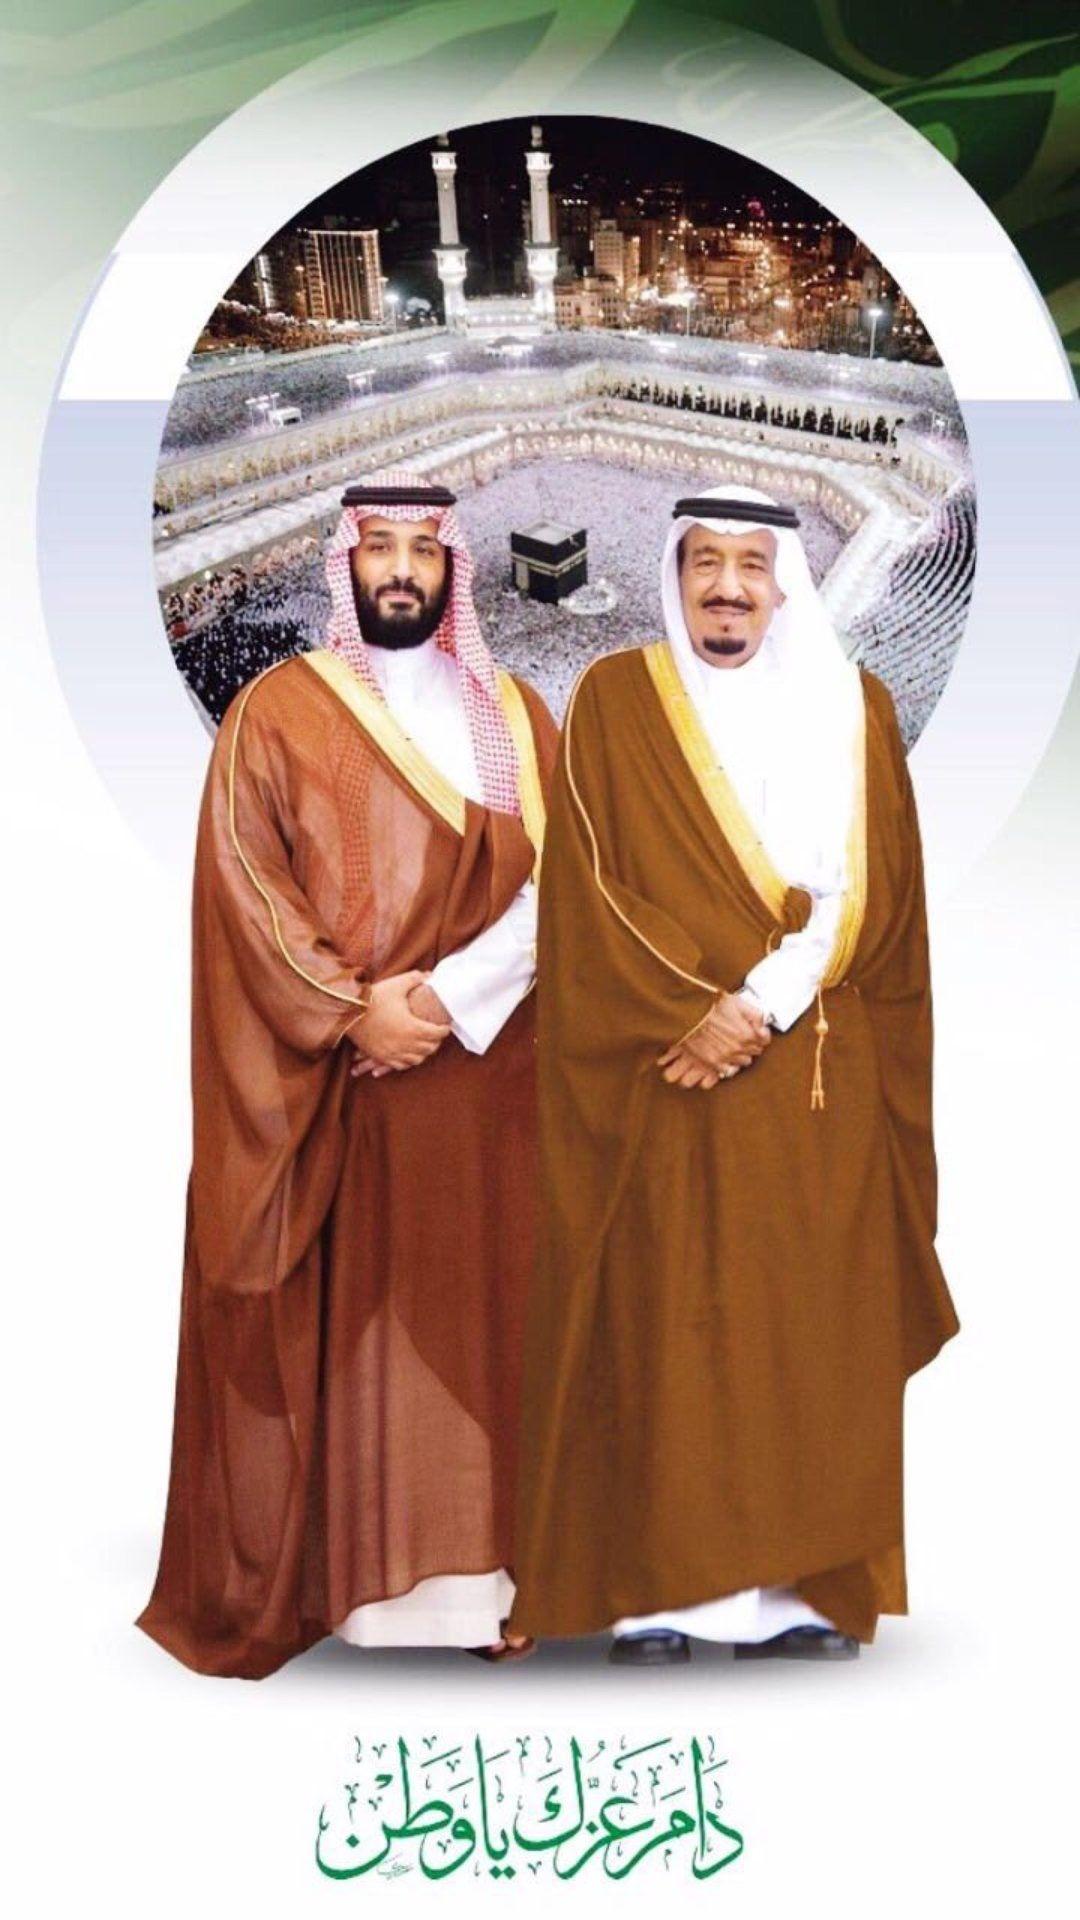 Pin By Nmg On دام عزك ياوطن Abaya Fashion Traditional Dresses King